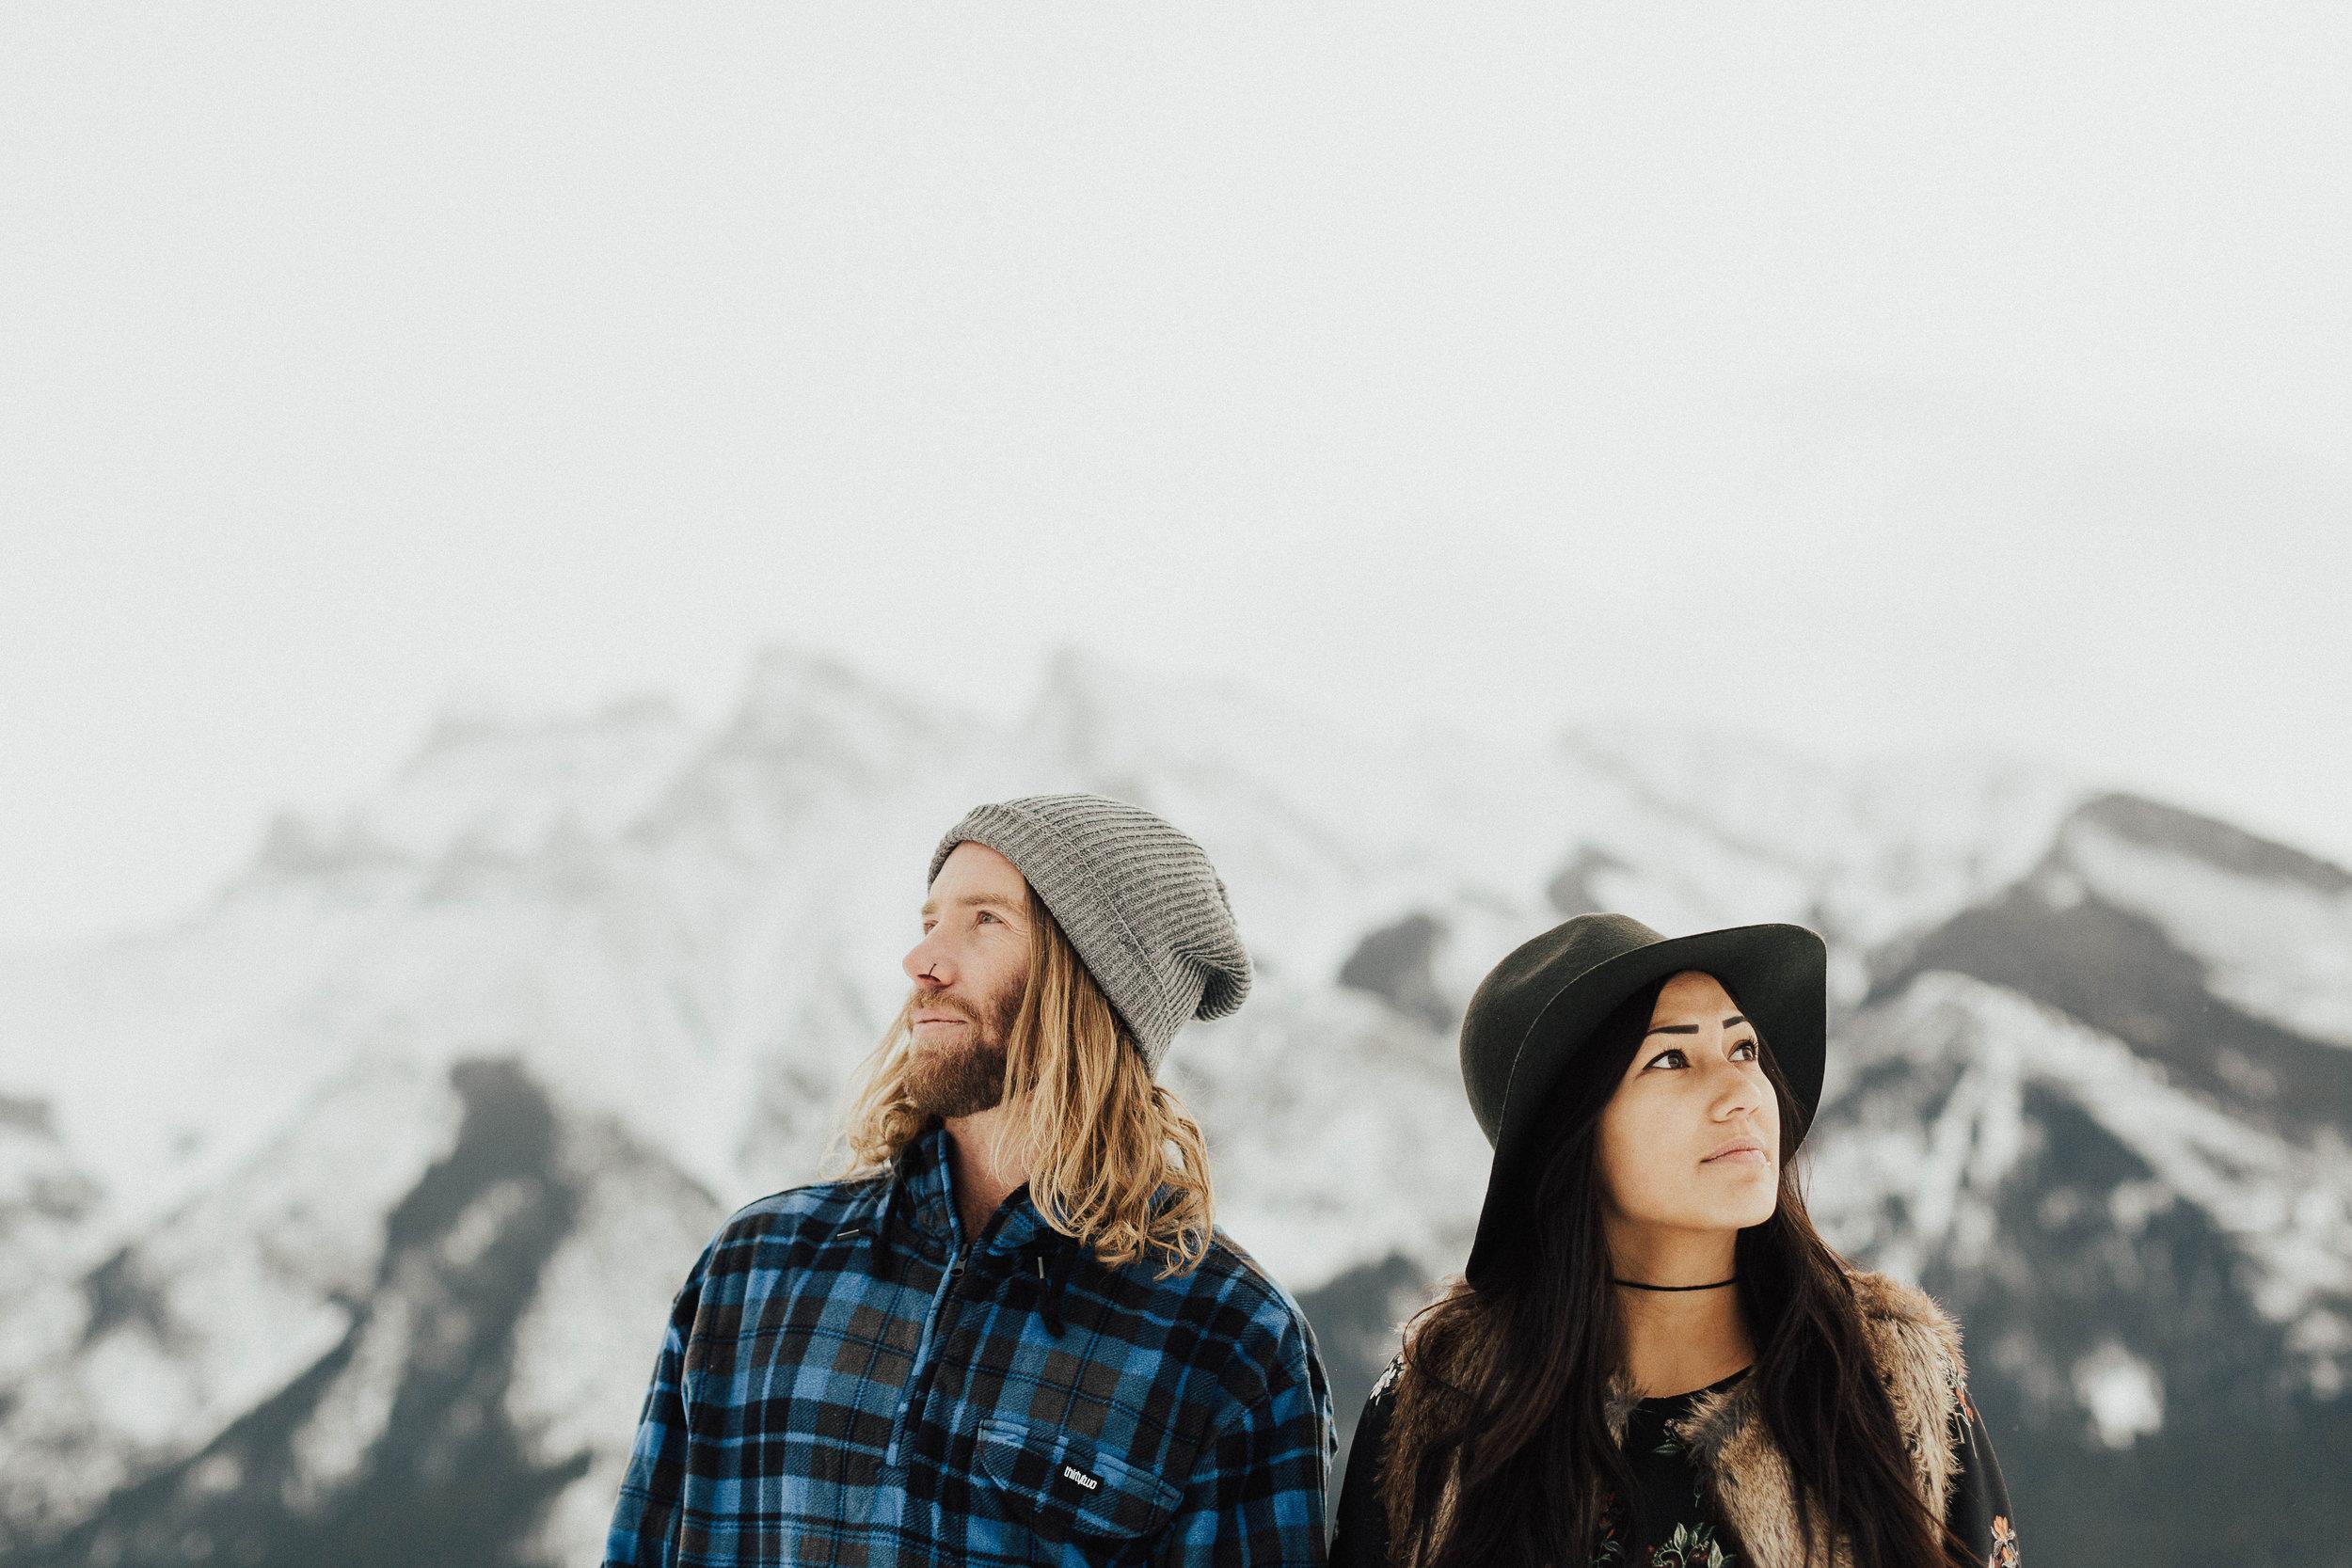 Banff Engagement Photographer - Winter Mountain Adventure Engagement Session - Michelle Larmand Photography-037